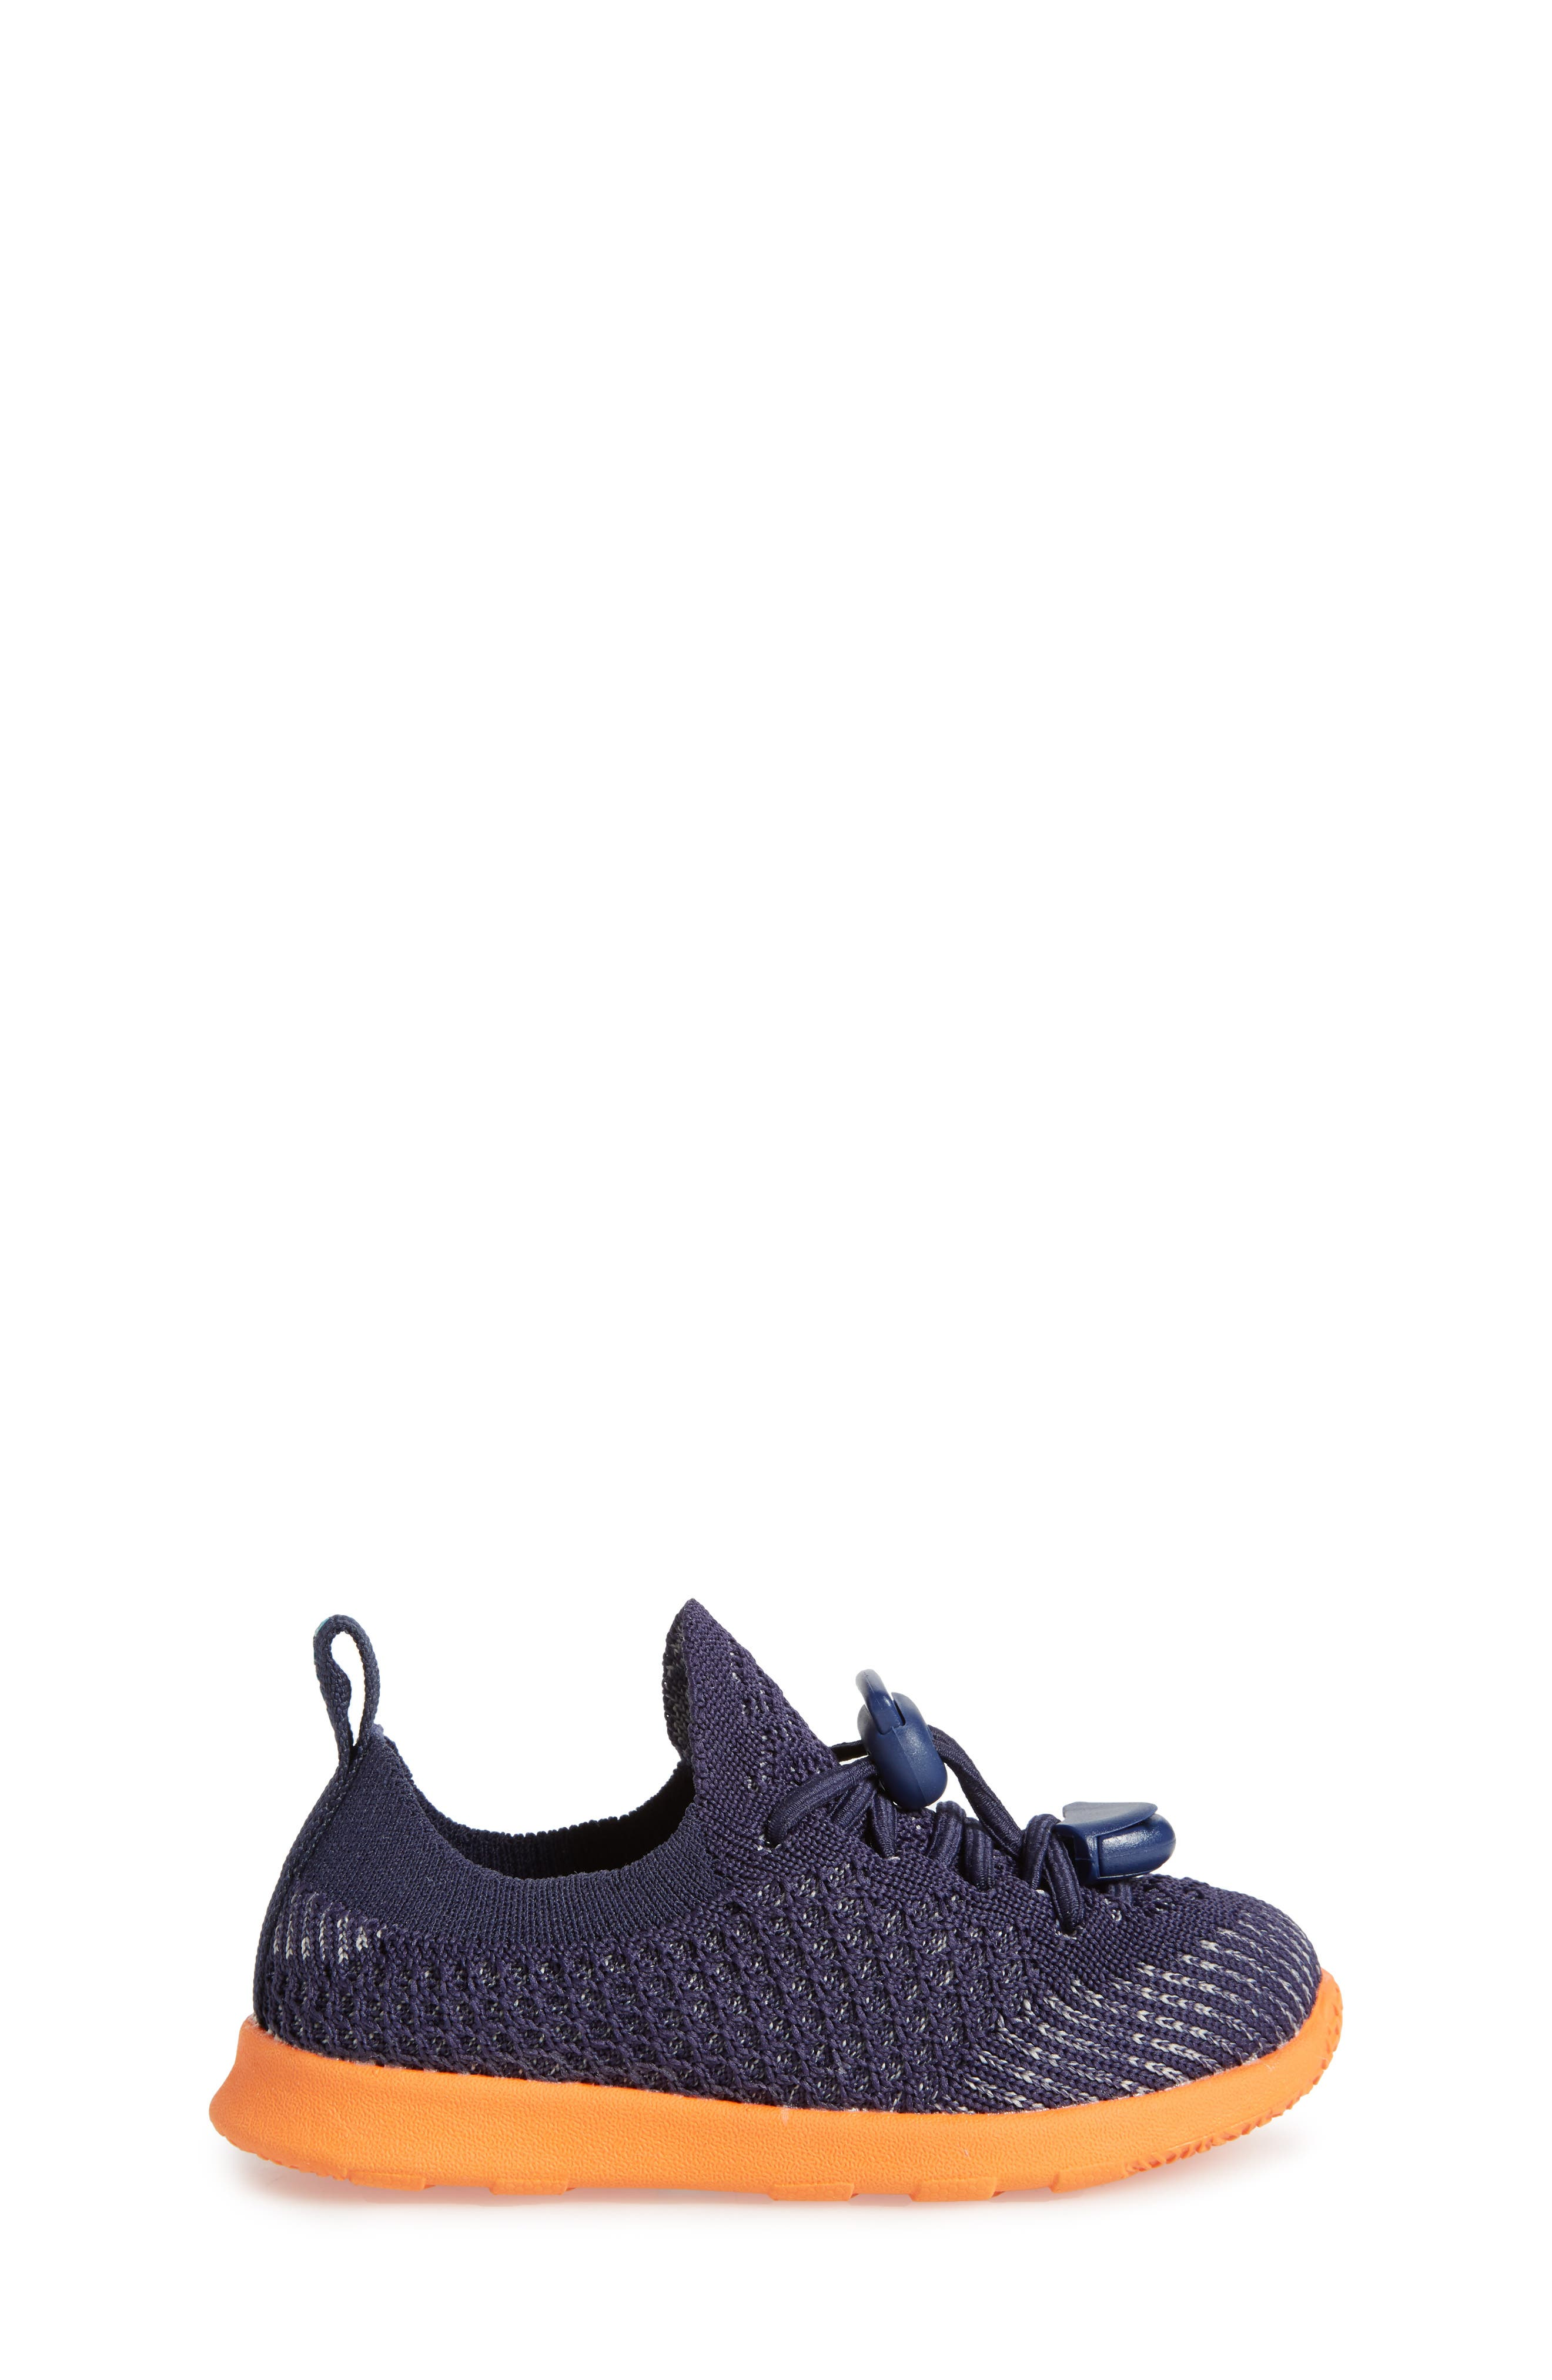 AP Mercury LiteKnit Sneaker,                             Alternate thumbnail 3, color,                             REGATTA BLUE/ SUNSET ORANGE